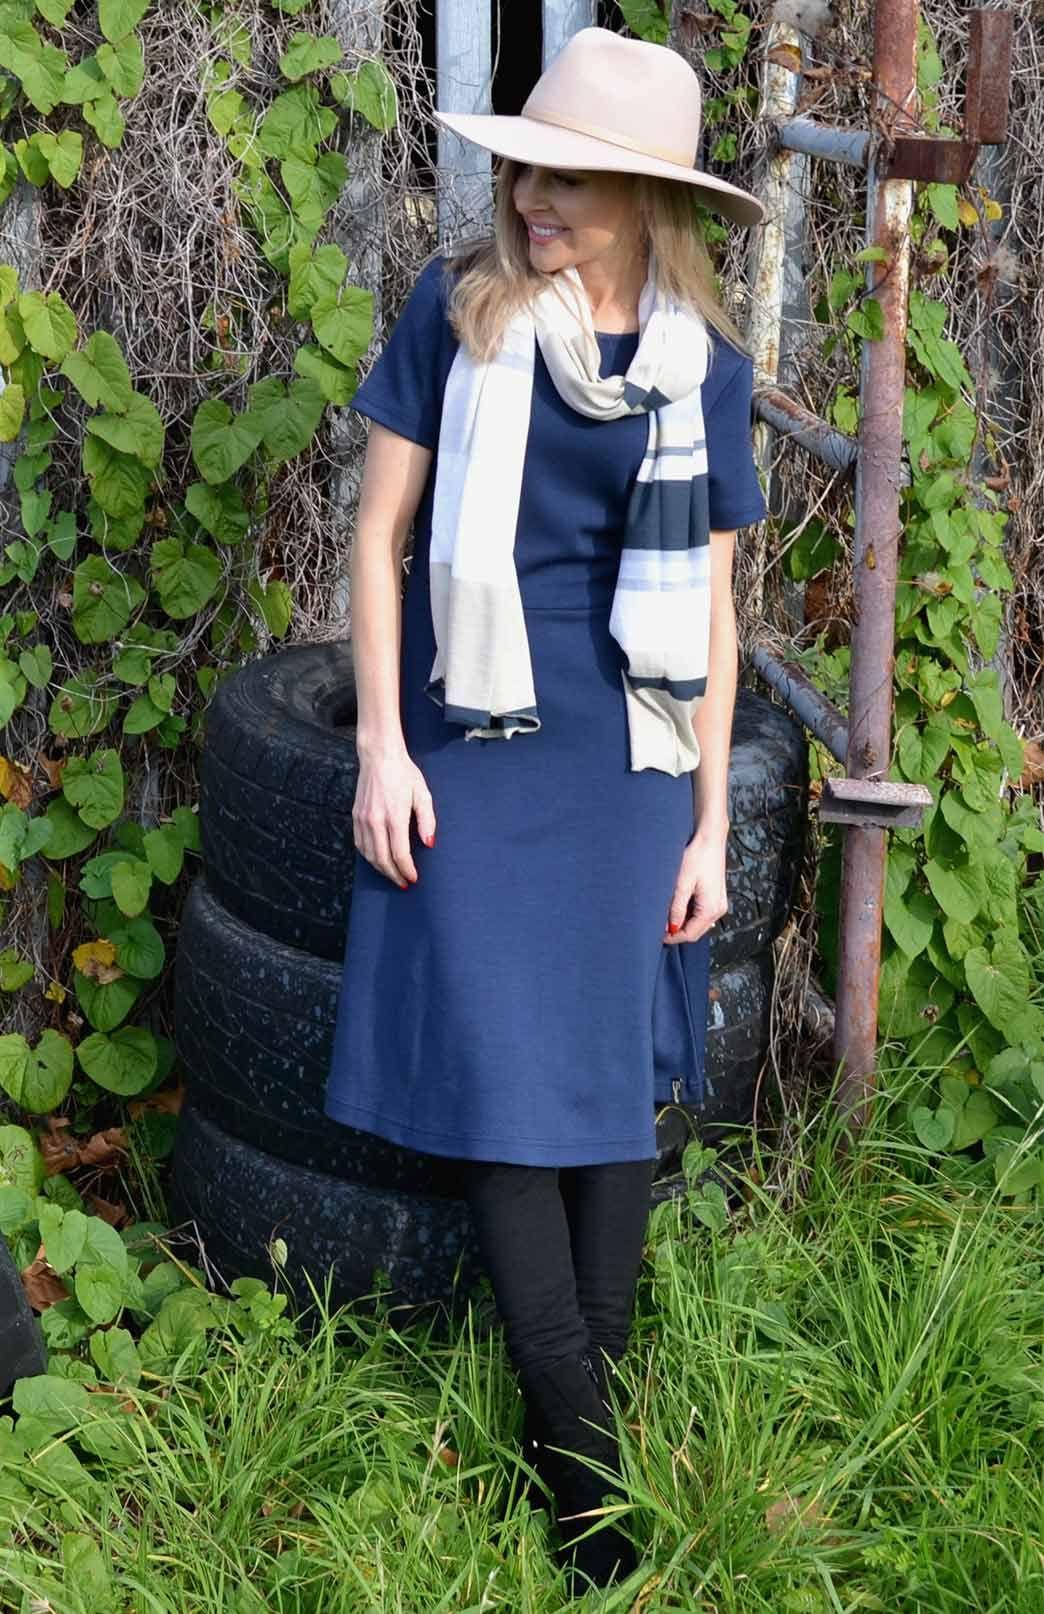 f07bb12b970f0 Zoe Dress    Indigo Blue    Women s Pure Merino Wool Dress with Short  Sleeves